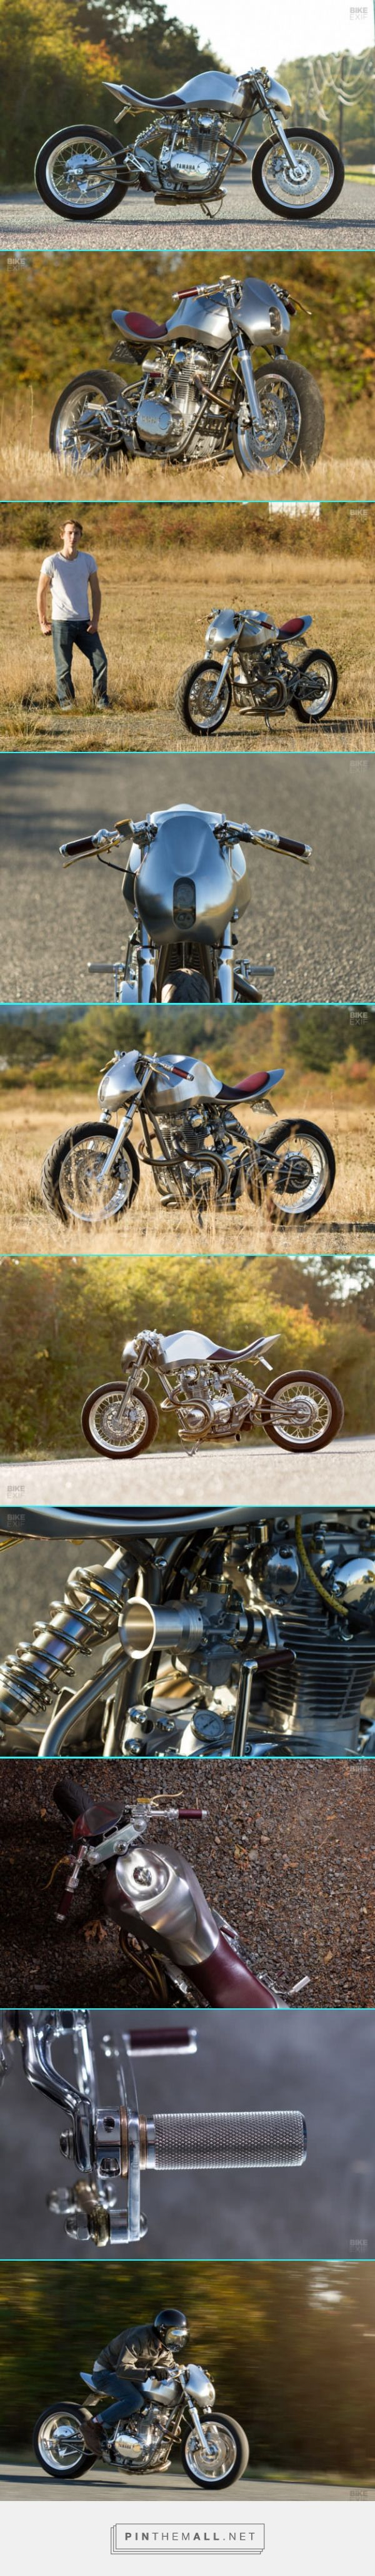 Master of Metal: Jay Donovan's amazing Yamaha XS650 | Bike EXIF - created via https://pinthemall.net